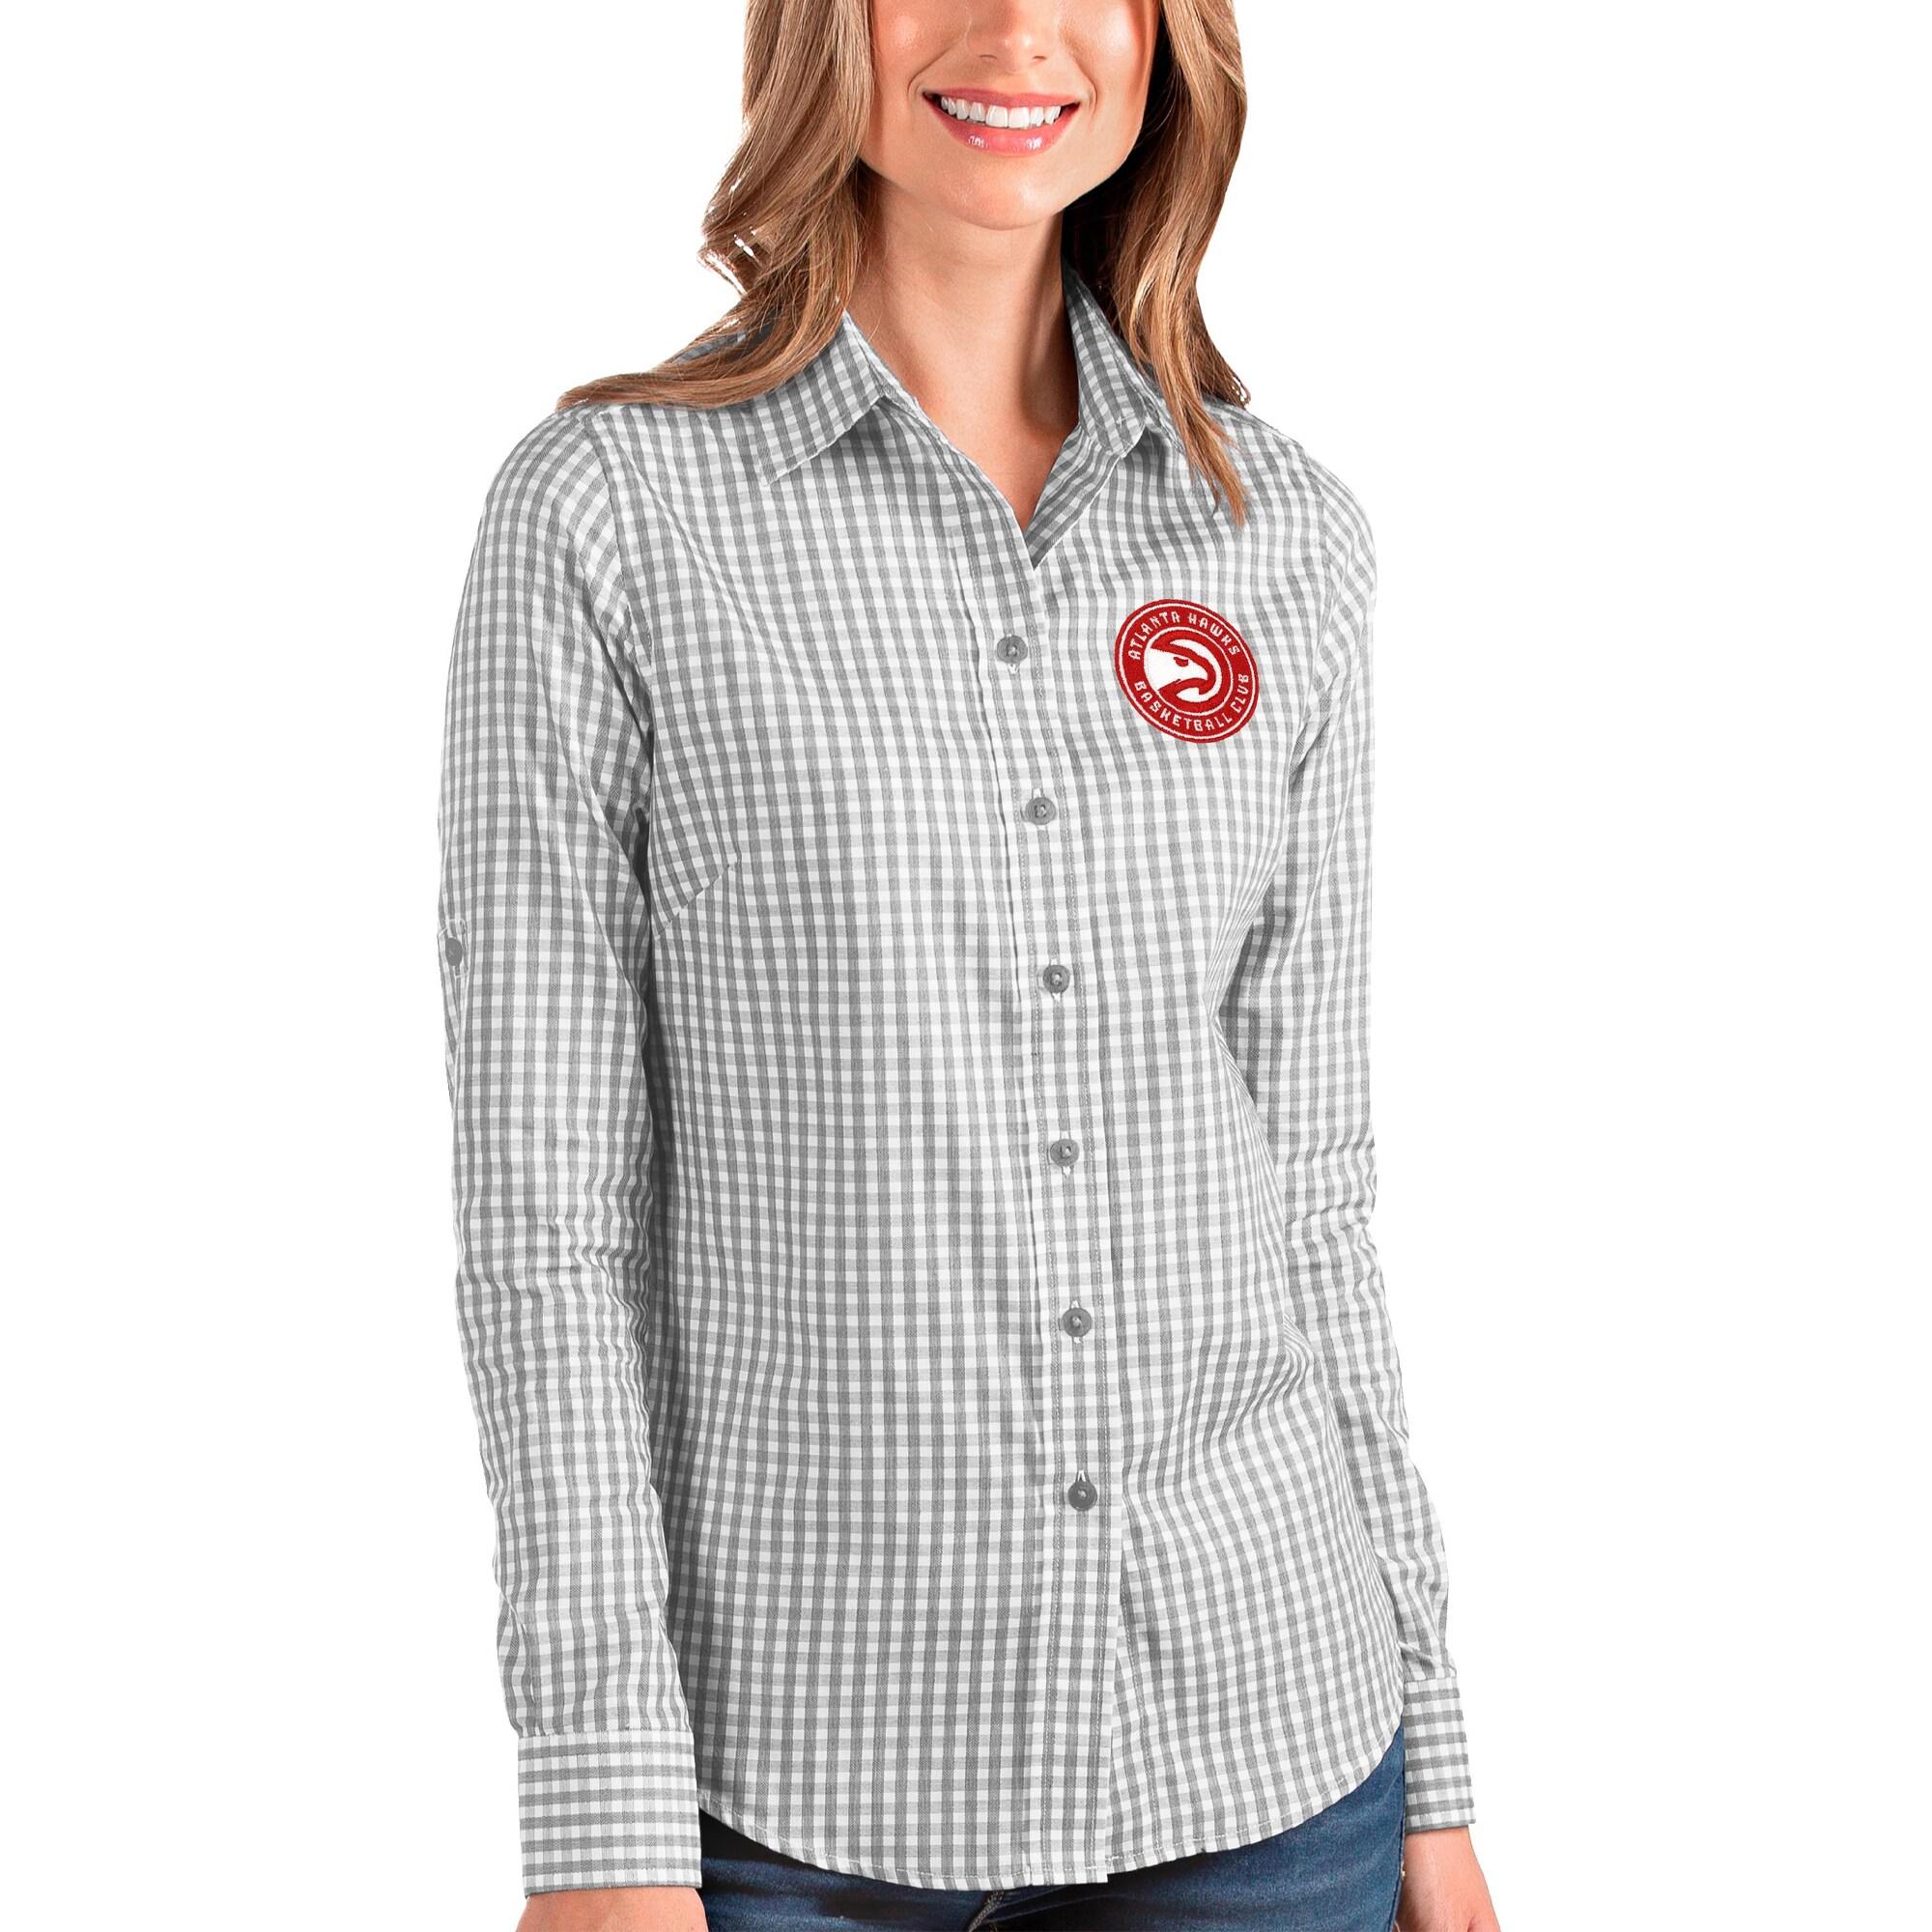 Atlanta Hawks Antigua Women's Structure Button-Up Long Sleeve Shirt - Charcoal/White